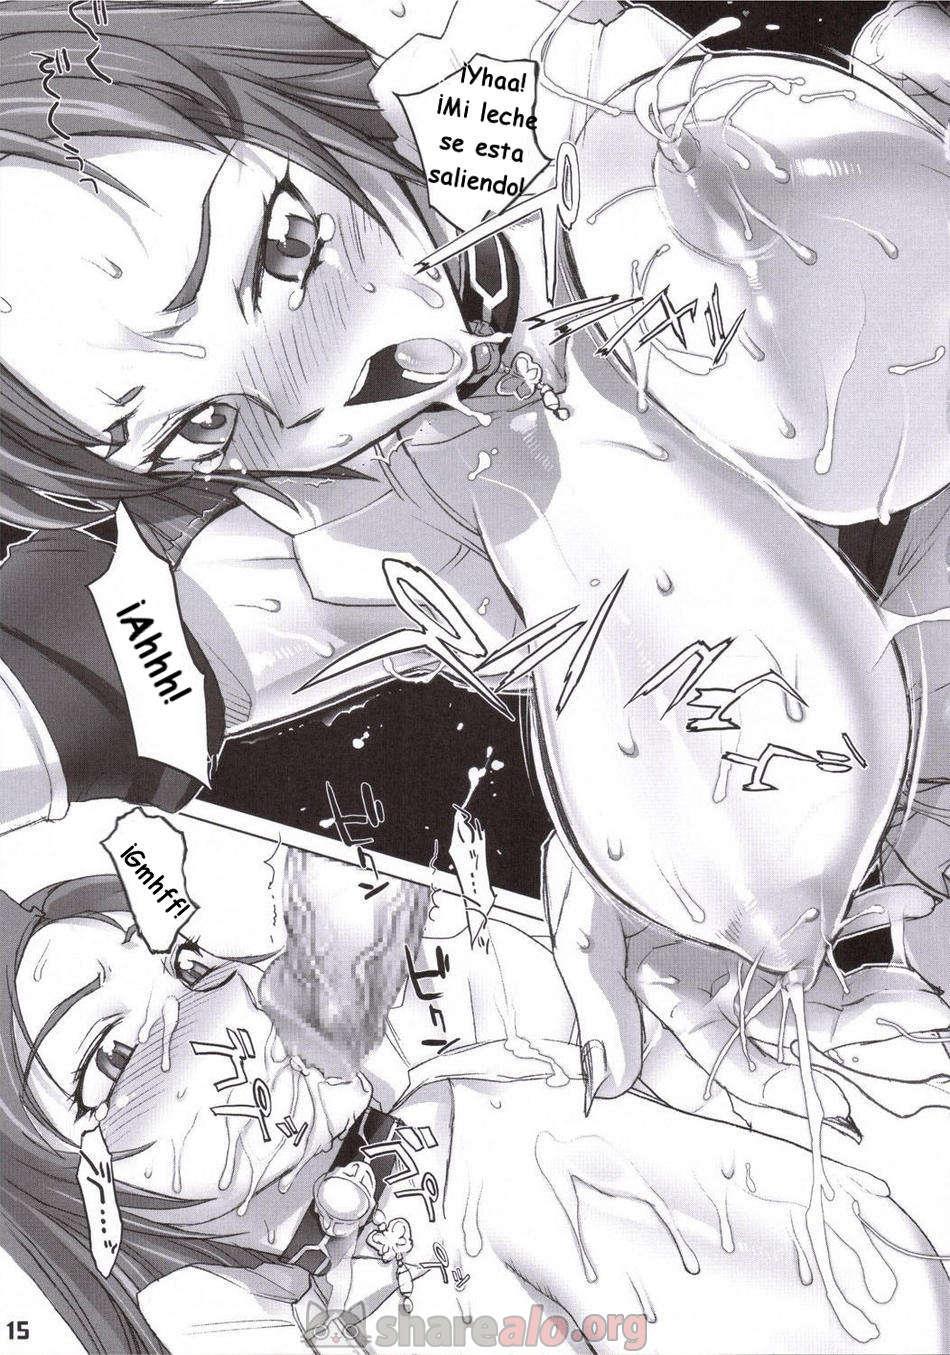 Hentai Manga Porno Firebird (Soulcalibur): KWAOhpXm